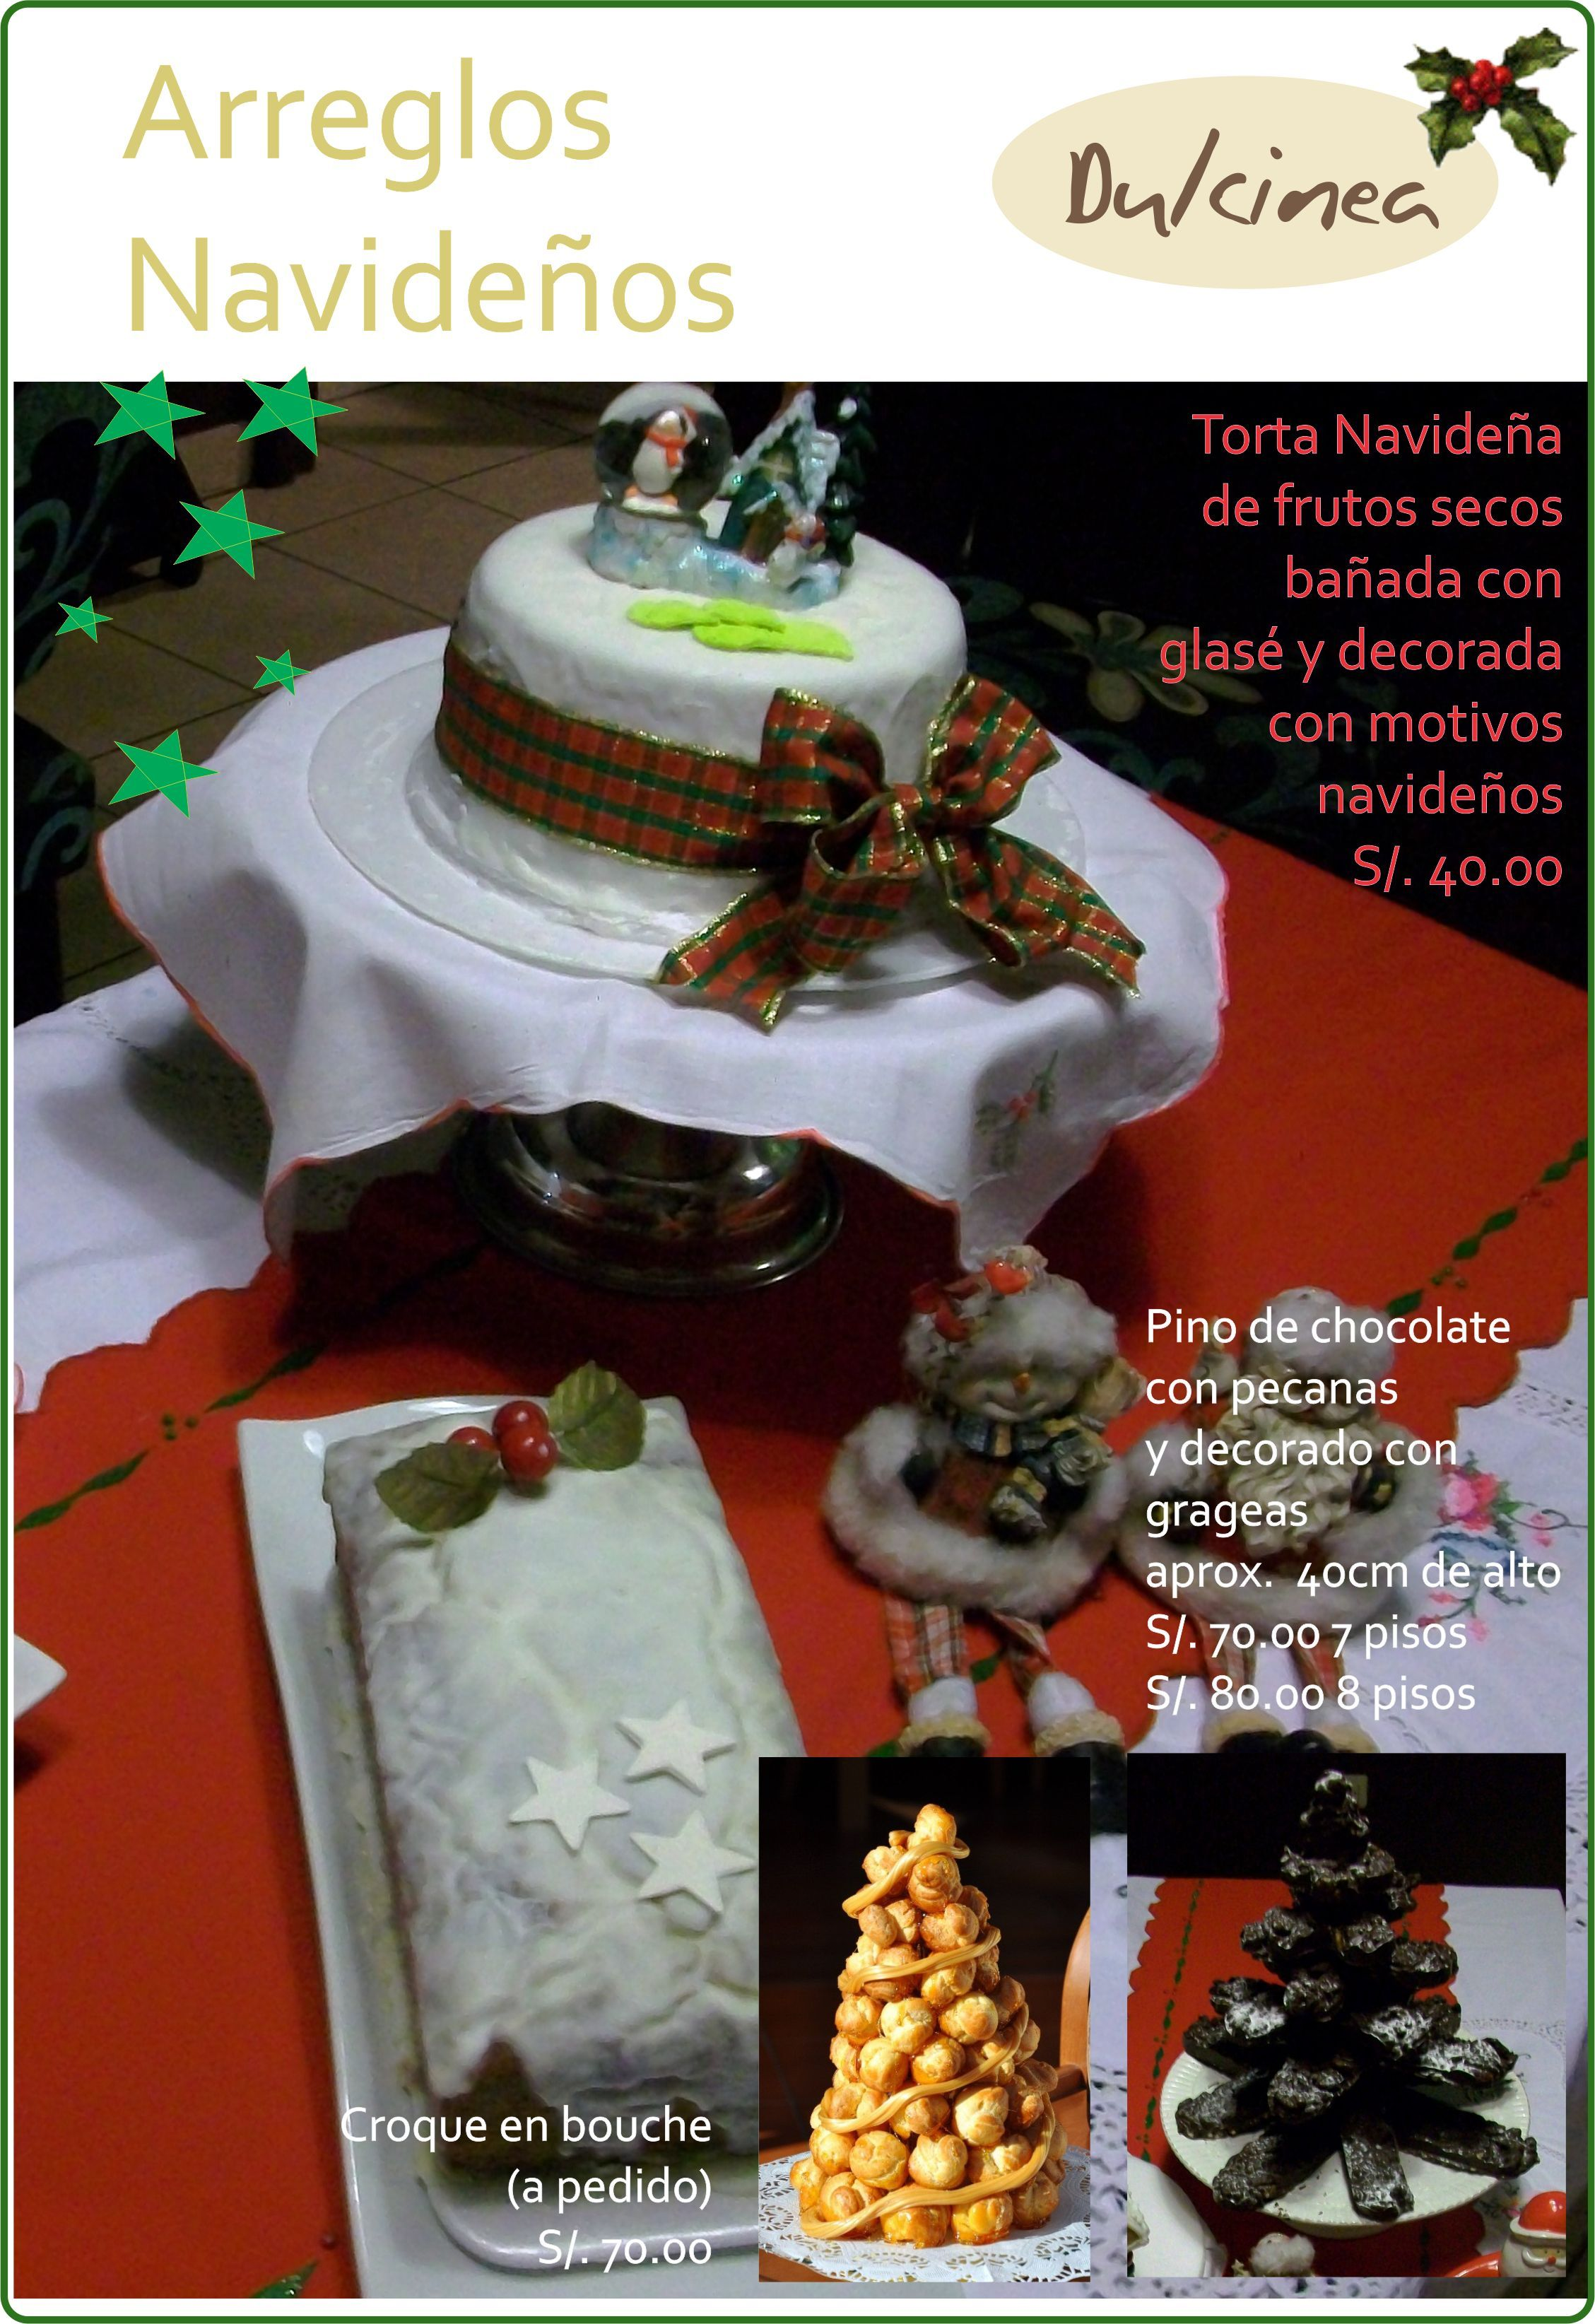 Arreglos navide os para centro de mesa y comestibles for Arreglos navidenos para mesa